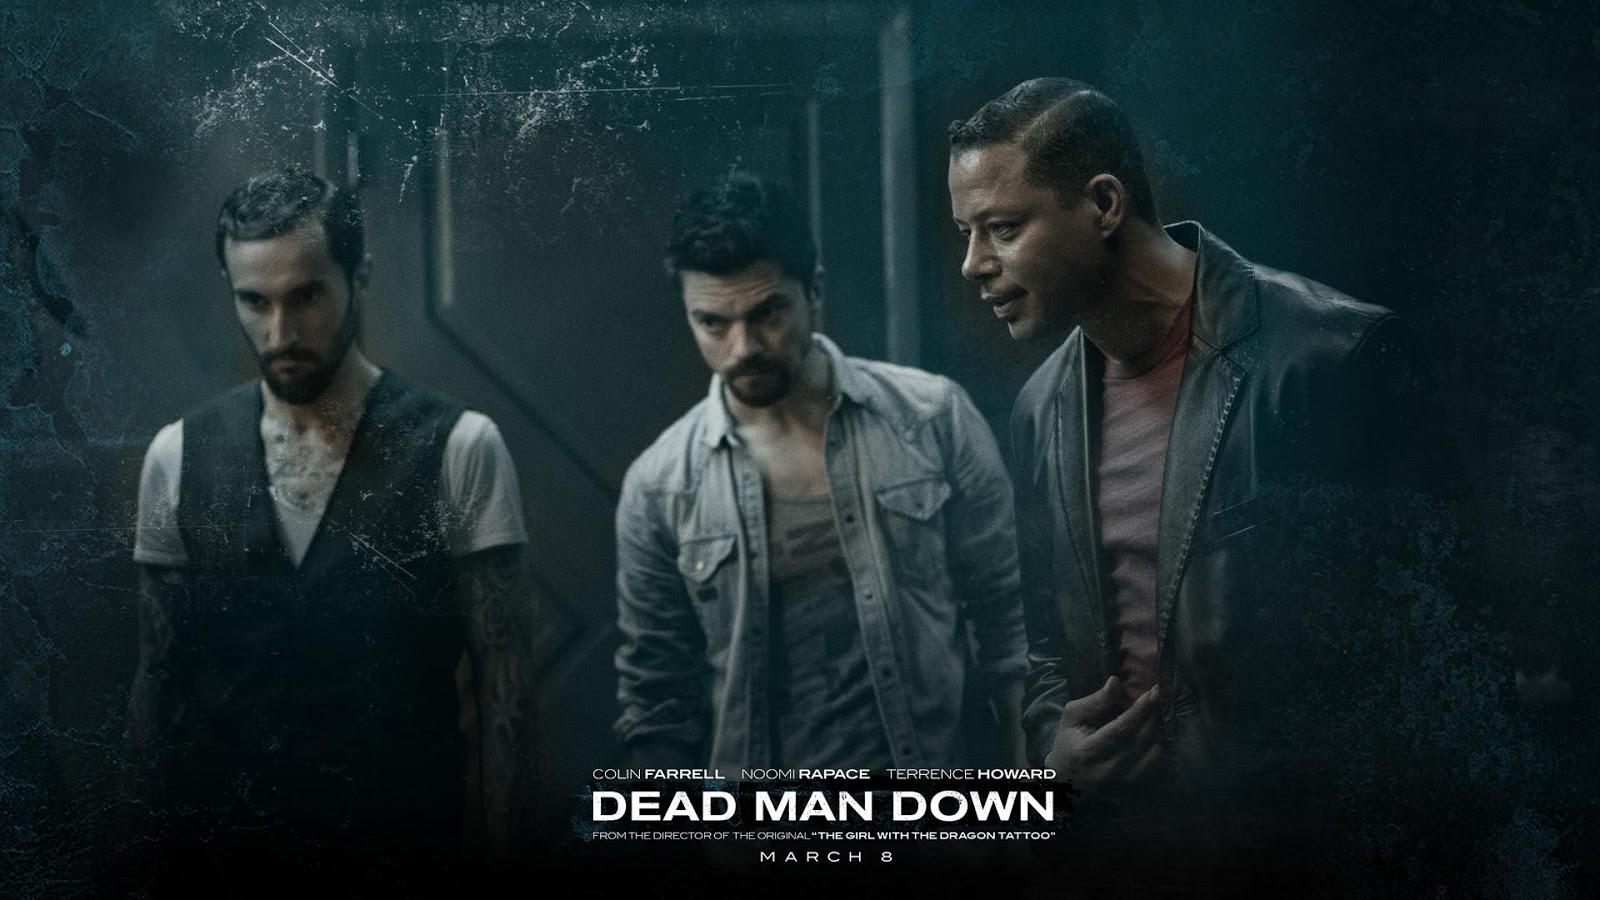 Dead Man Down Movie Wallpapers: Mega Film Recap: July, August & September